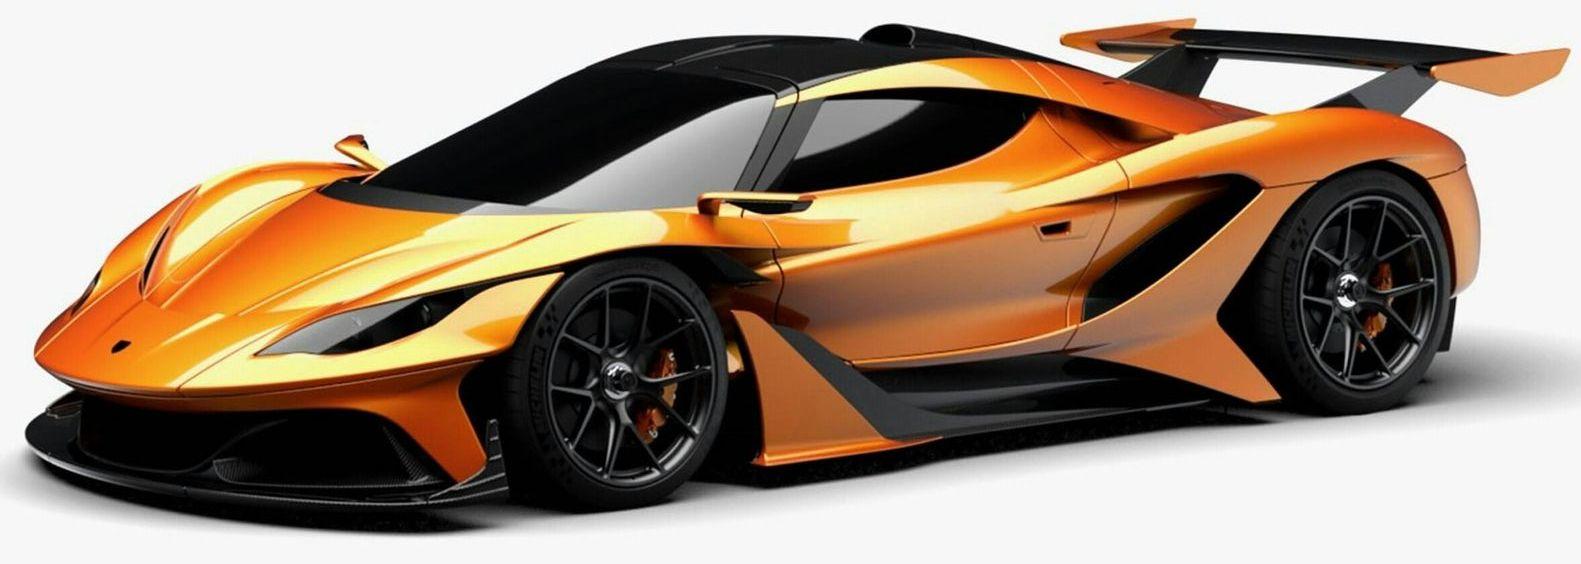 Apollo Arrow 2016 Apollo arrow, Super sport cars, Best